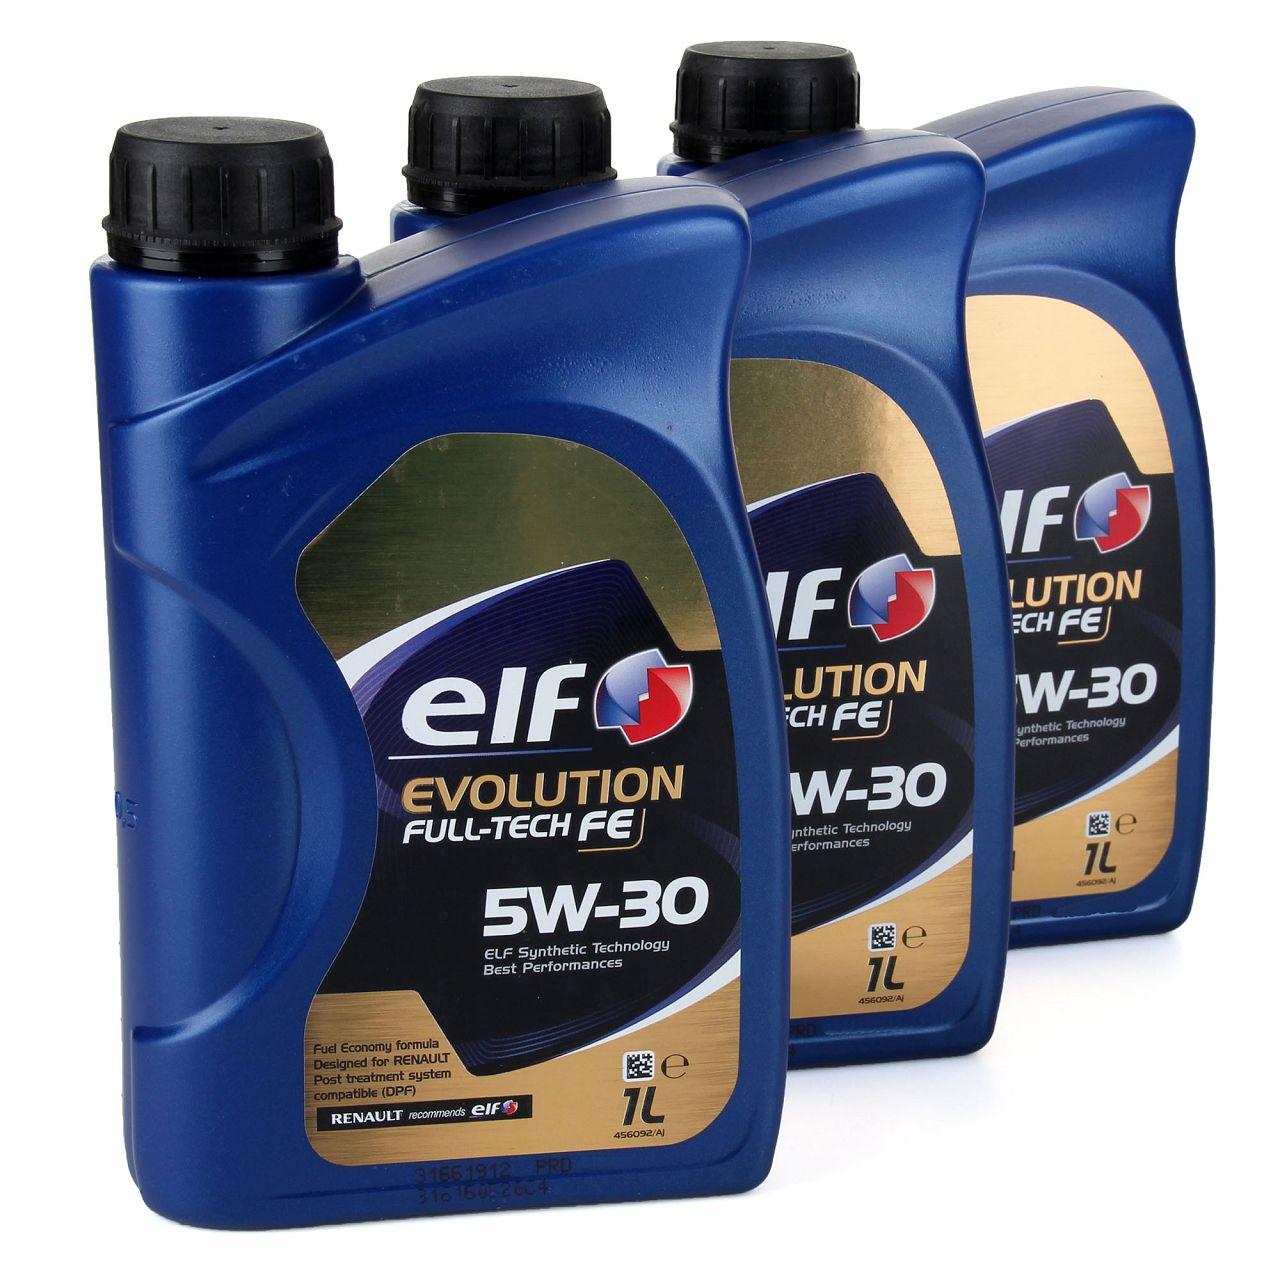 elf Evolution Full-Tech FE 5W-30 Motoröl RENAULT RN0720 MB 226.51 - 3L 3 Liter